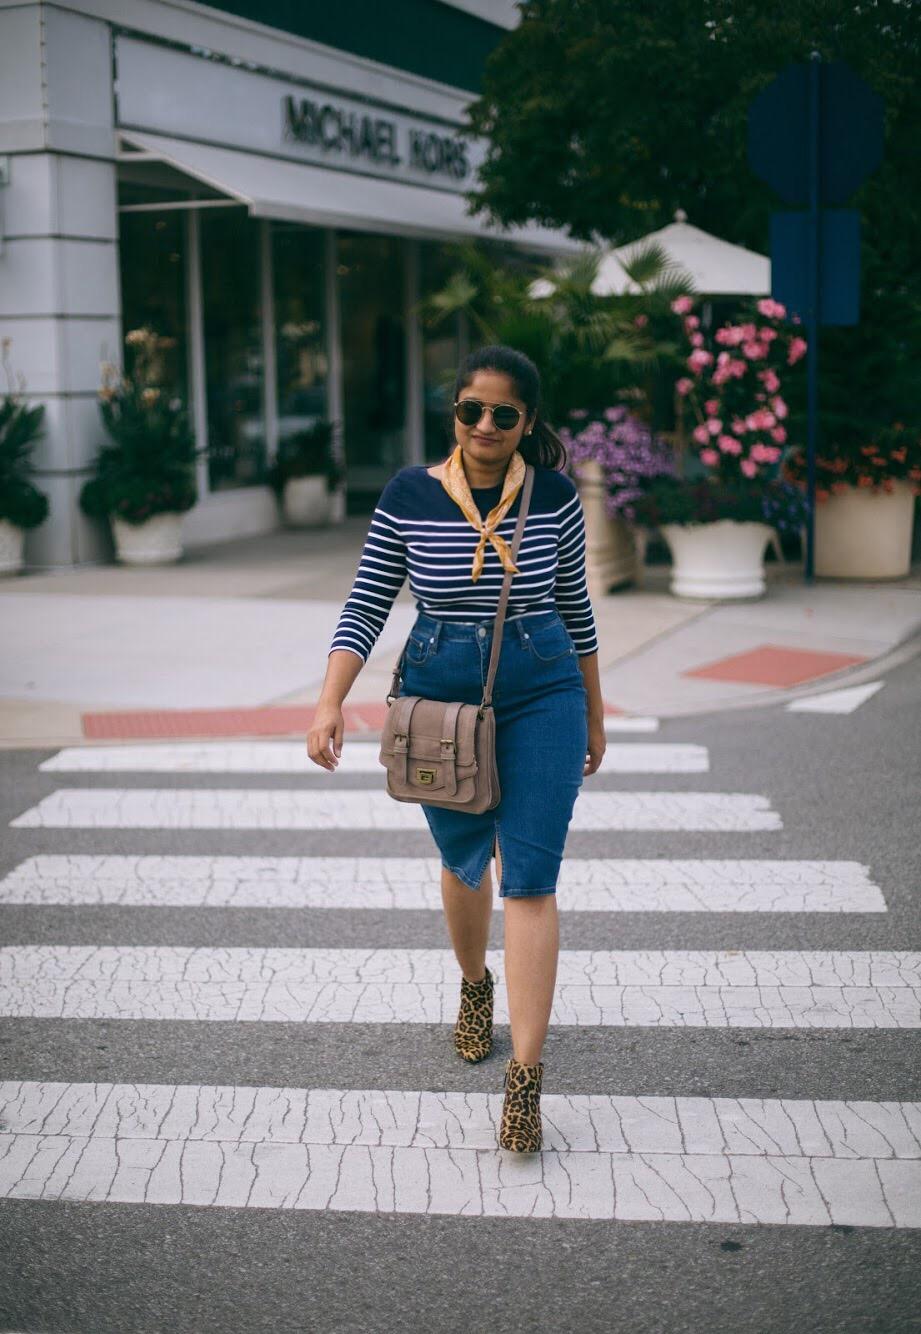 Lifestyle-blogger-Surekha-of-dreaming-loud-wearing-Banana-Republic-Seamed-Denim-Pencil-Skirt-1